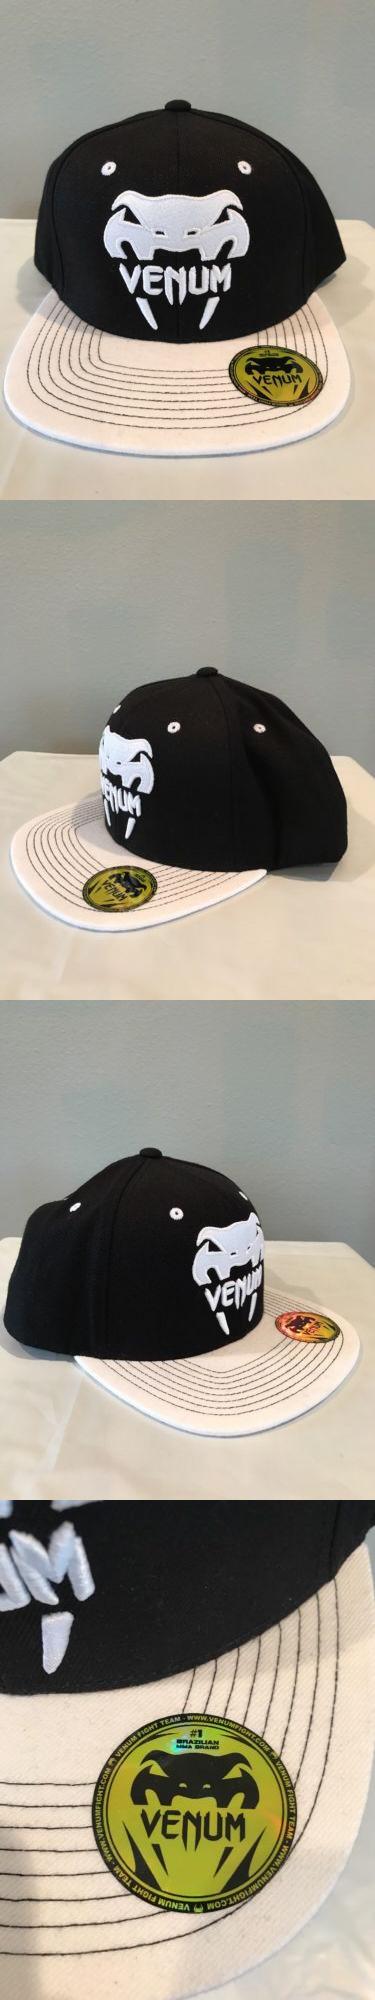 Headbands And Hats 179769 Mens Venum Logo Snapback Hat New Cap Mma Bjj Jiu Jitsu Muay Thai Black White Buy It Now Only 35 Snapback Hats Hats Bjj Jiu Jitsu